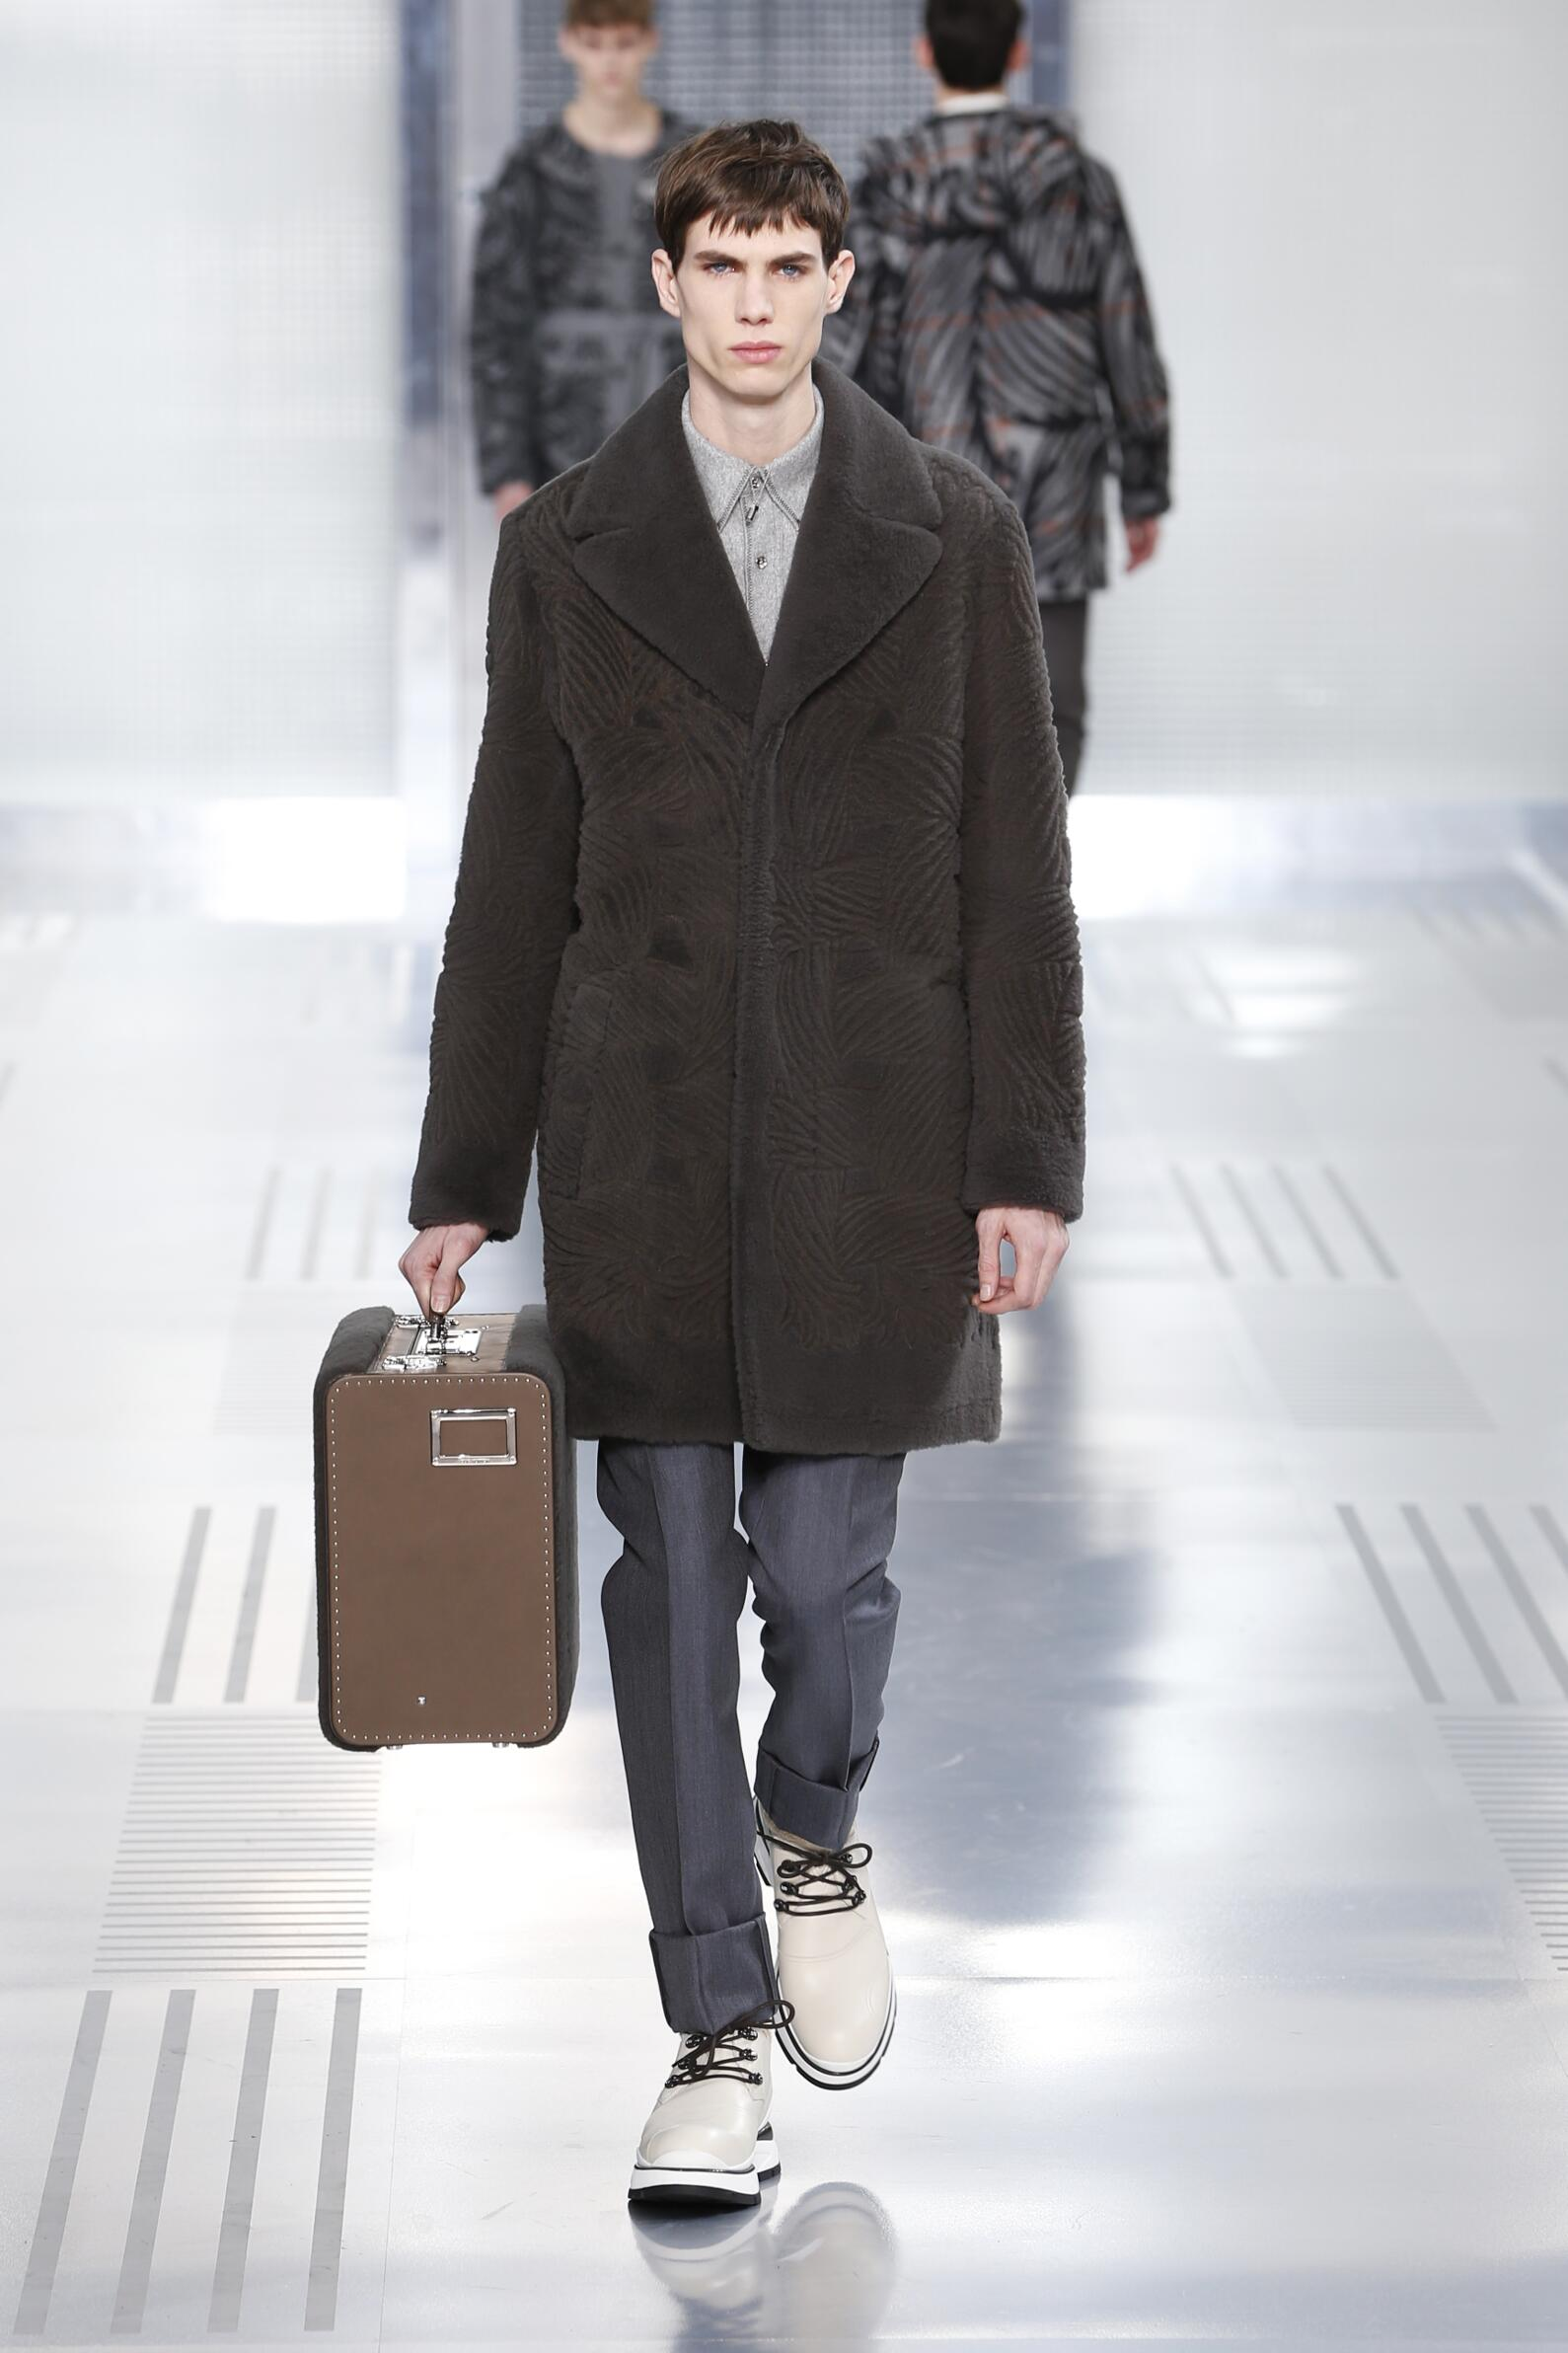 Fashion Model Louis Vuitton Collection Catwalk